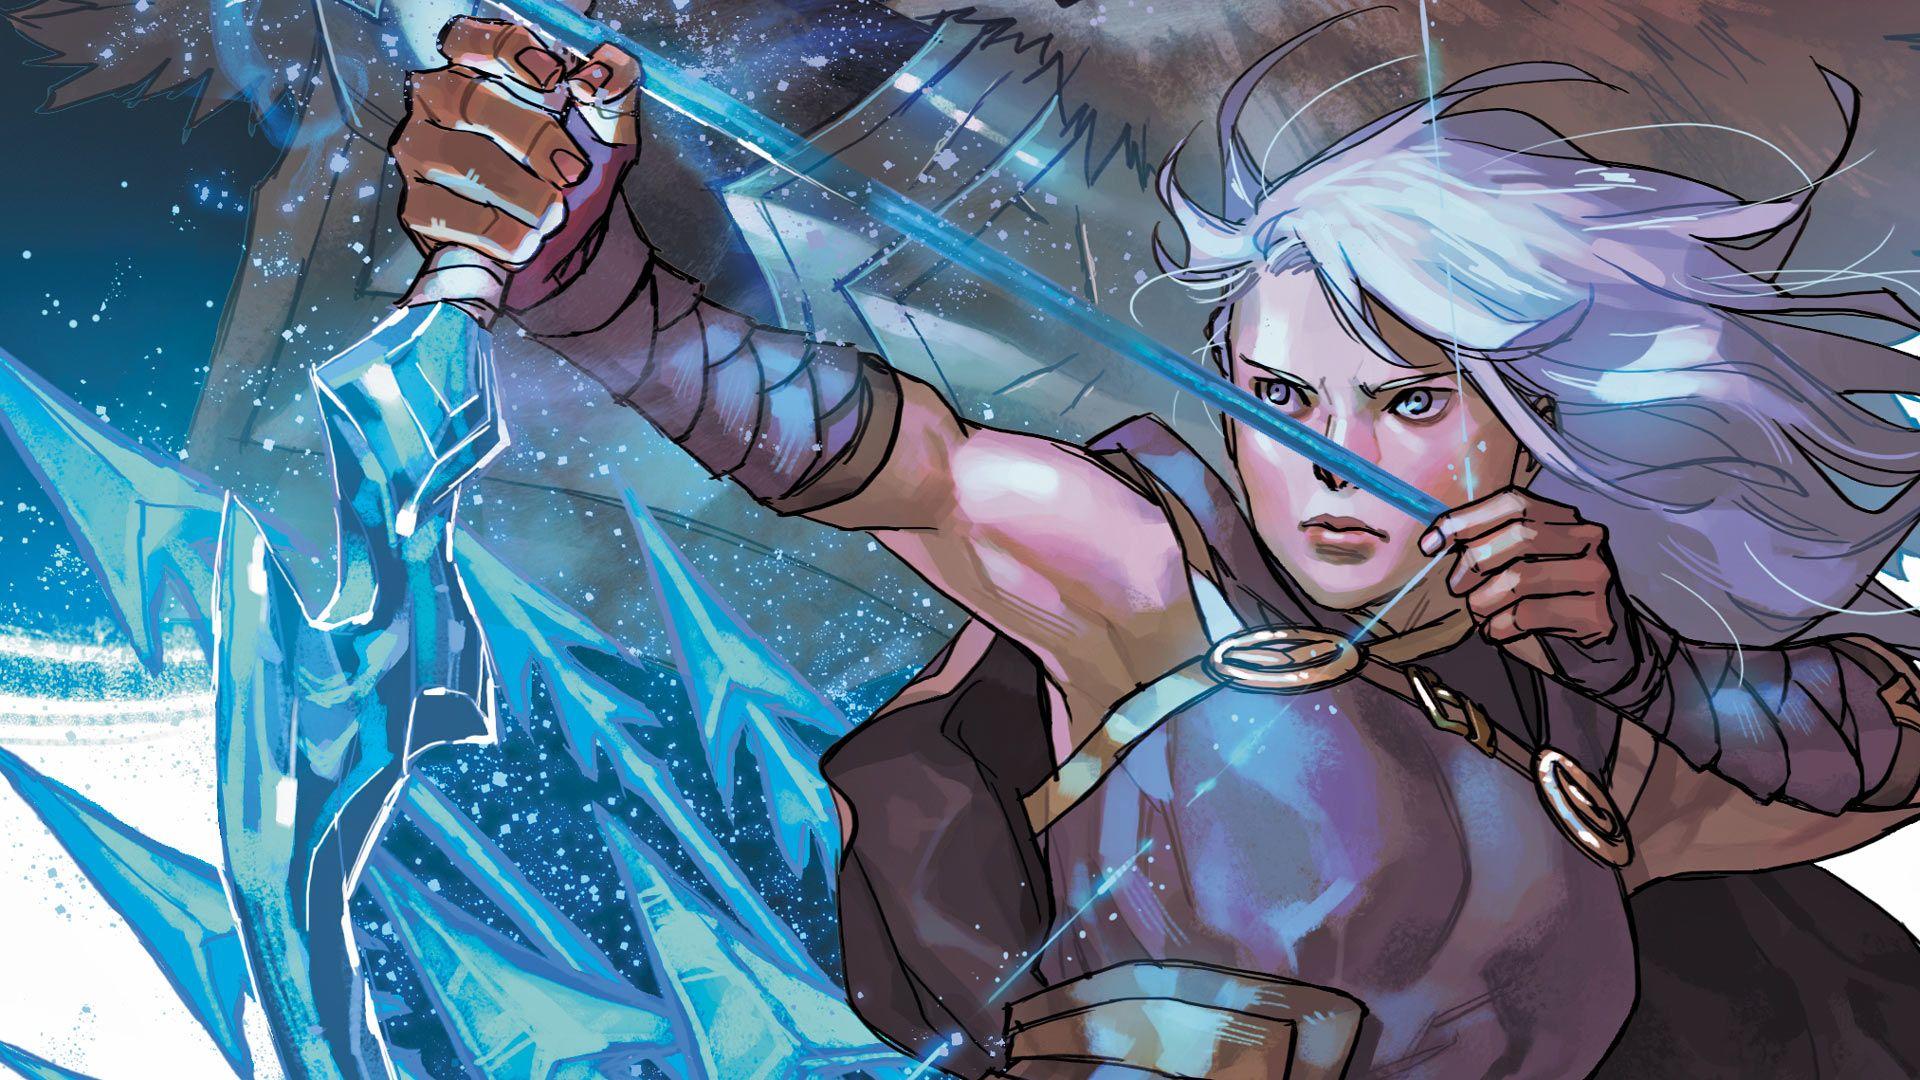 Foto de Ashe comandante - en el comic de Marvel y League of Legends